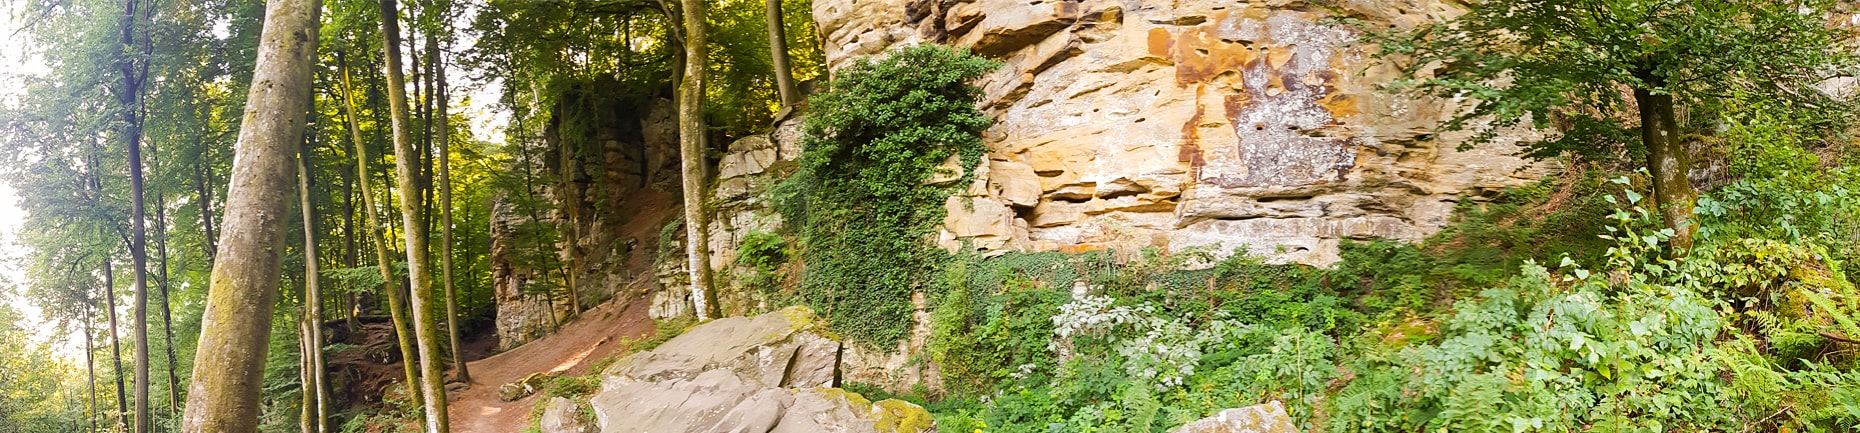 Felsenweg-Teufelsschlucht-Ernzen-Echternach-NaturWanderPark-delux-Wanderfalkeonline